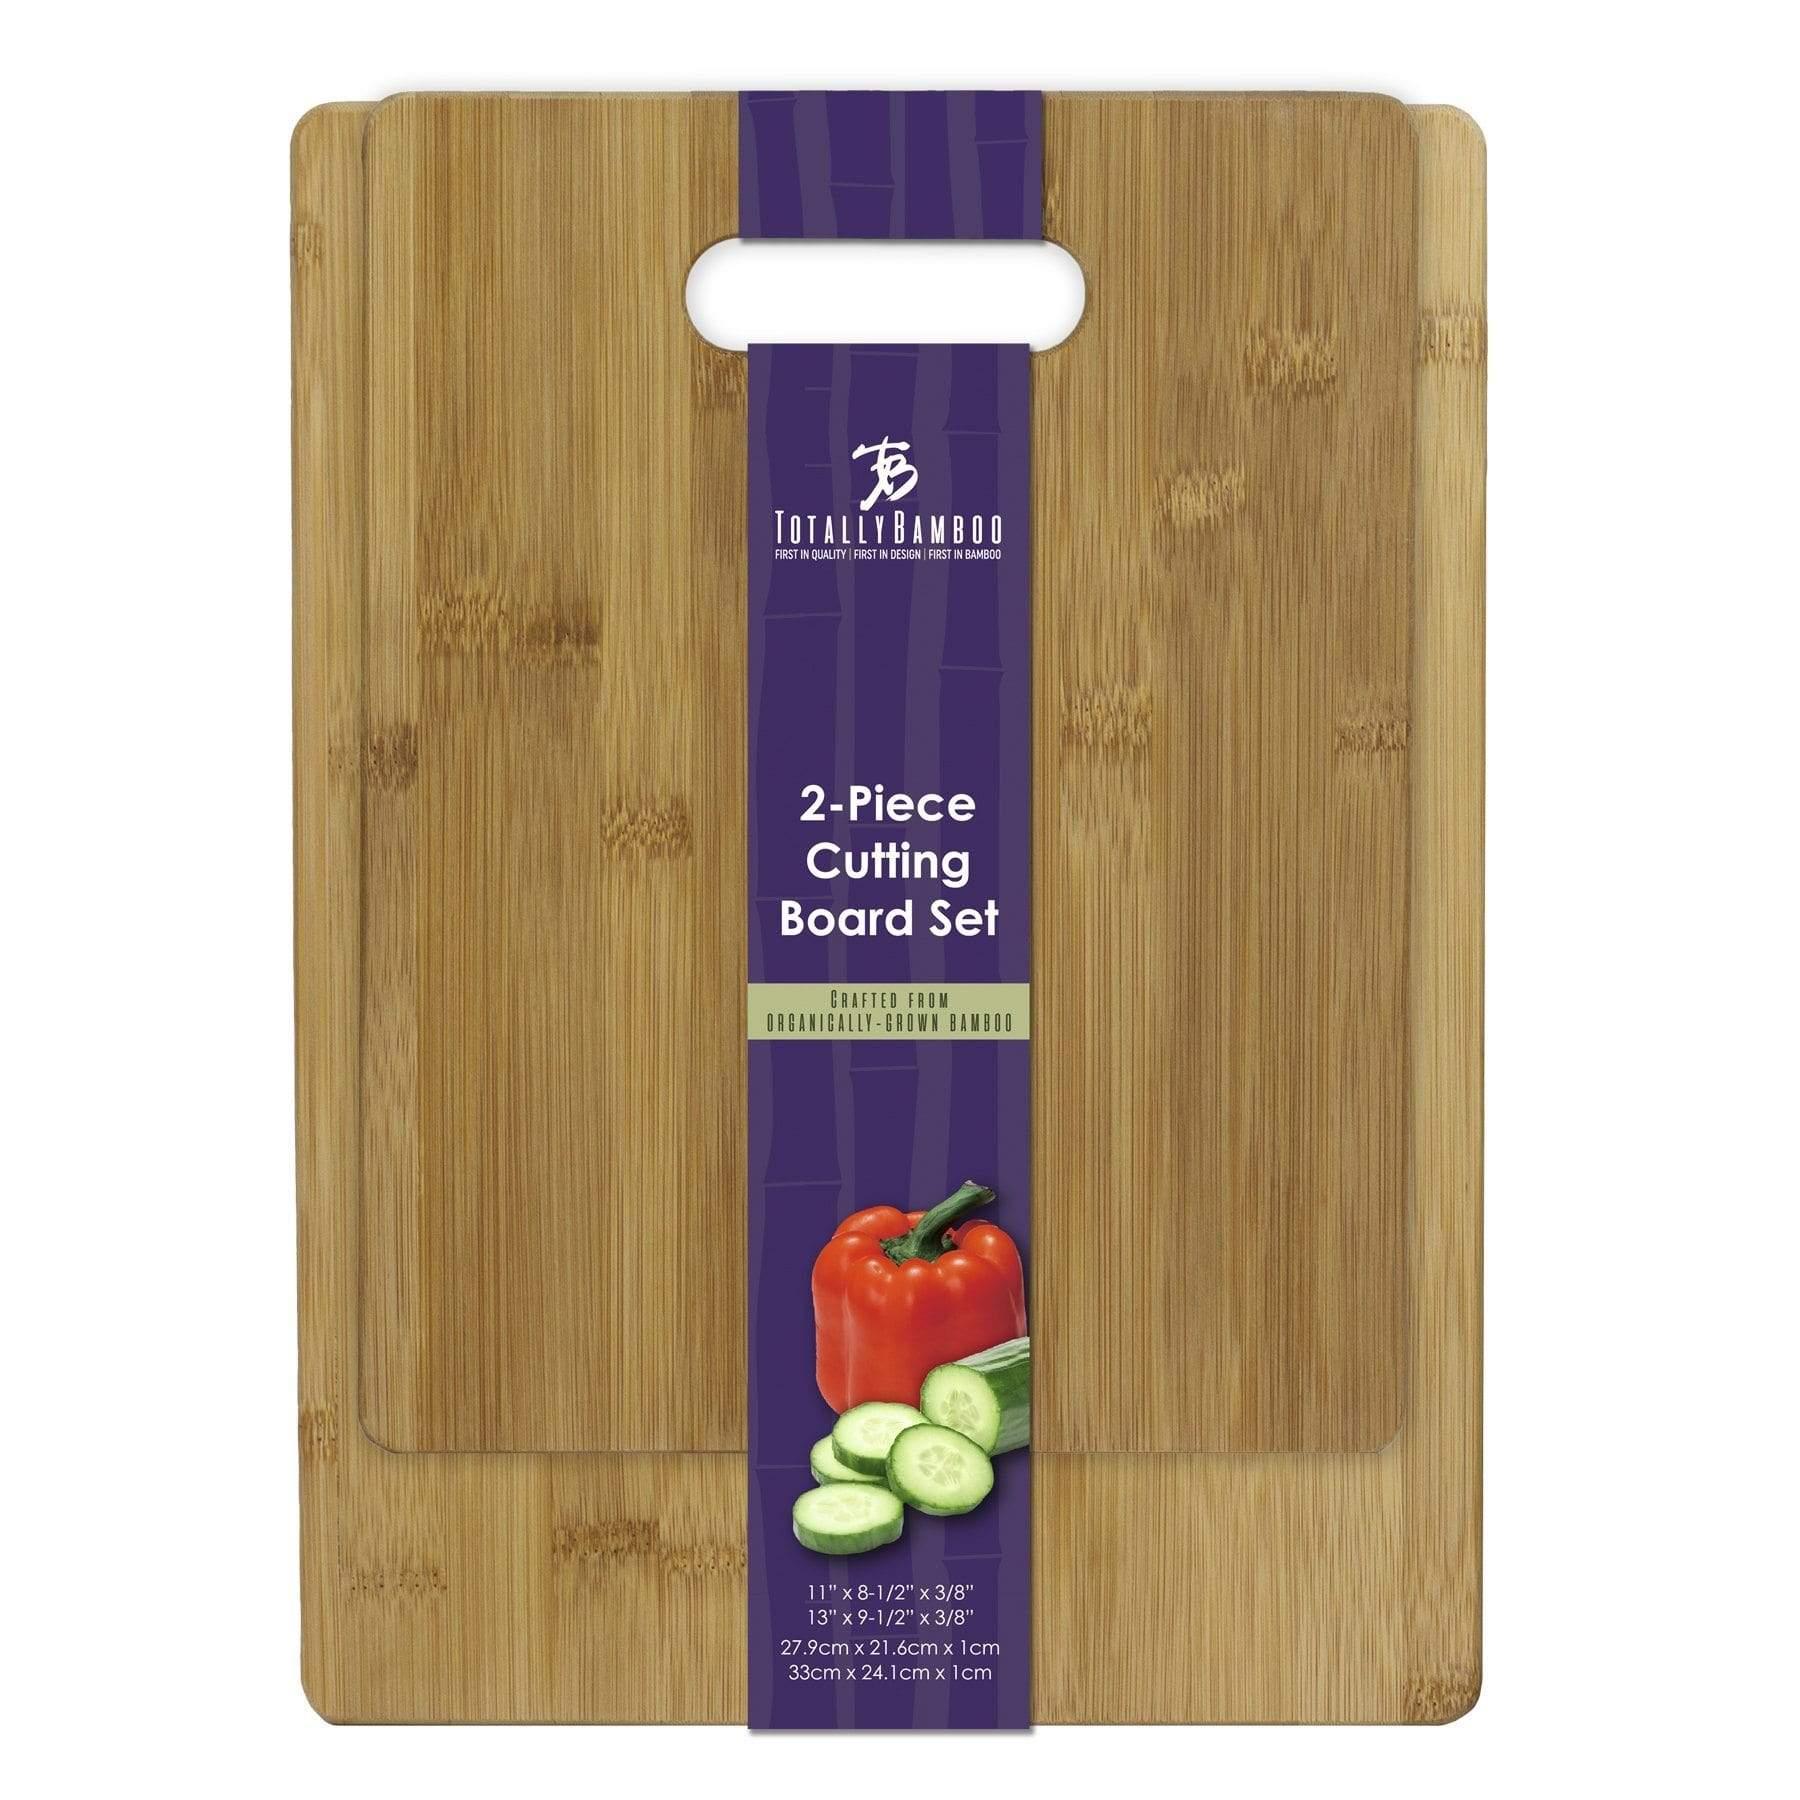 Fleurish Home 2-Piece Cutting Board Set